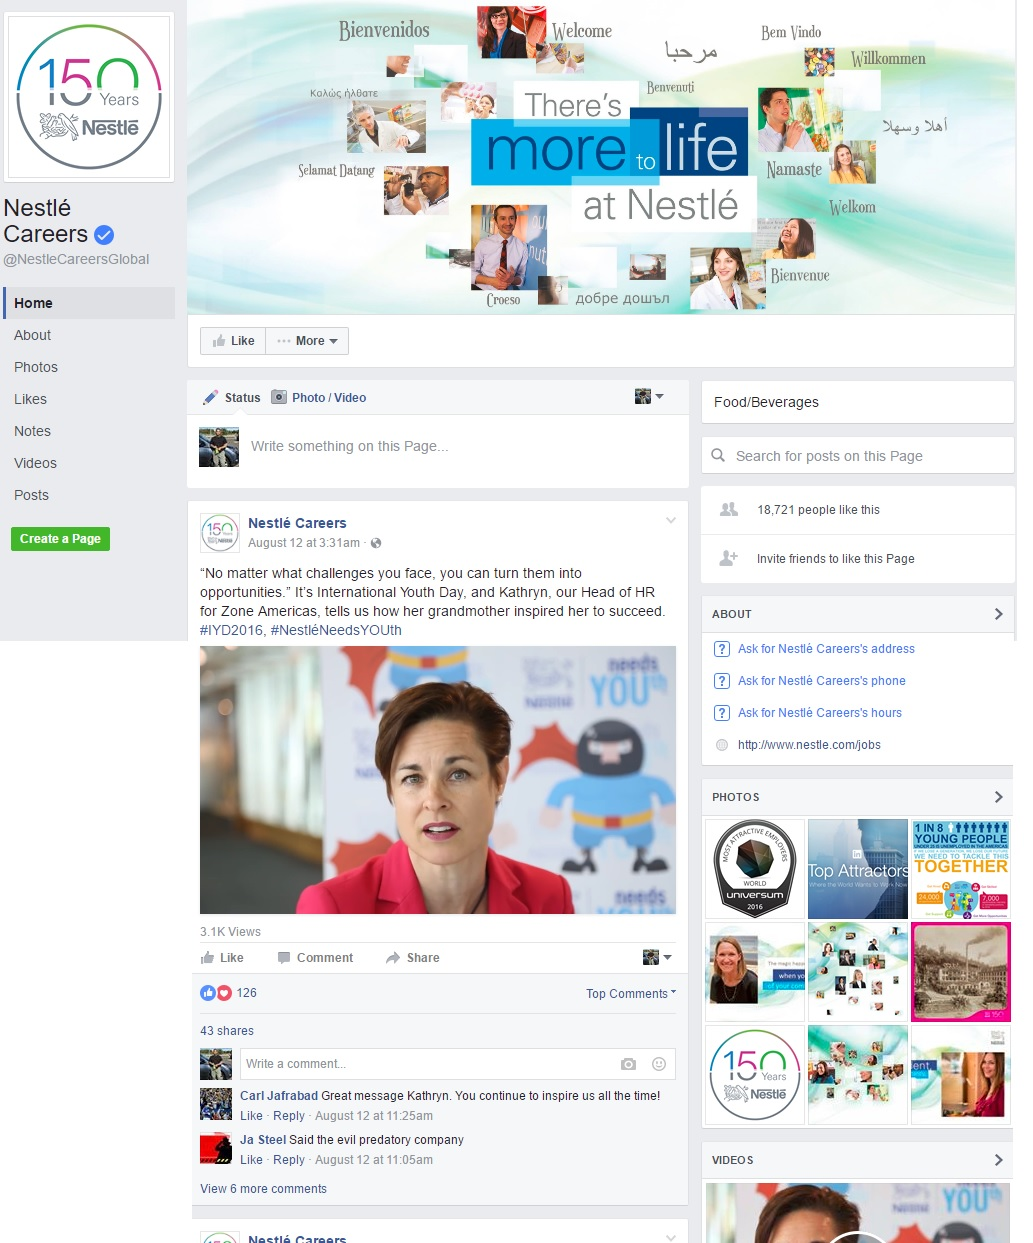 Nestle Facebook Careers Page Whole Ongig Blog